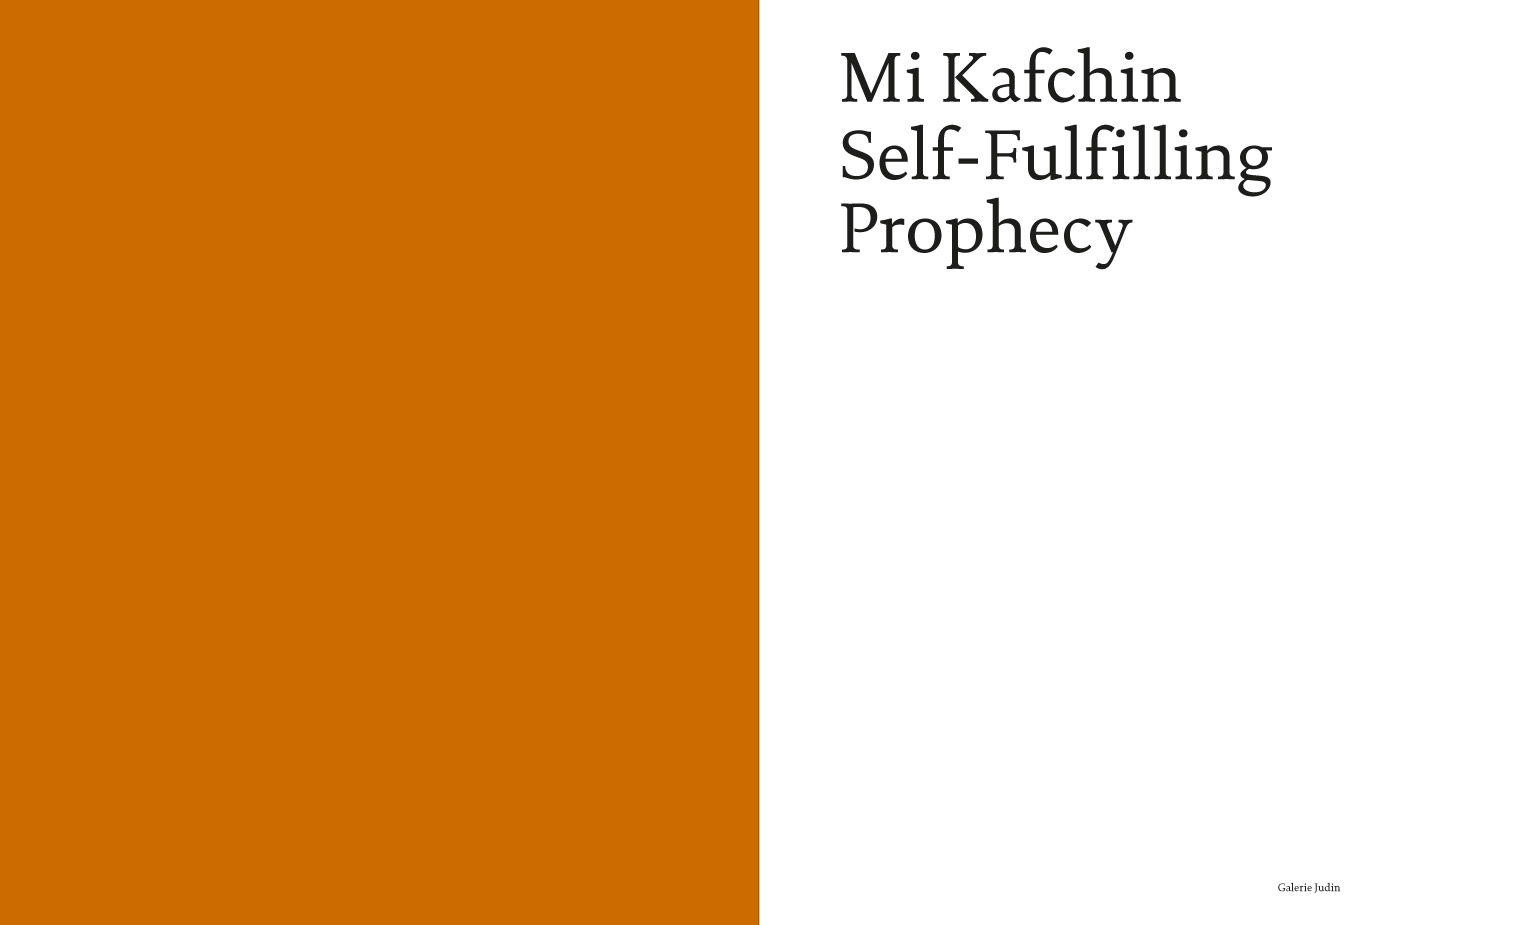 2018 Mi Kafchin Self-Fulfilling Prophecy